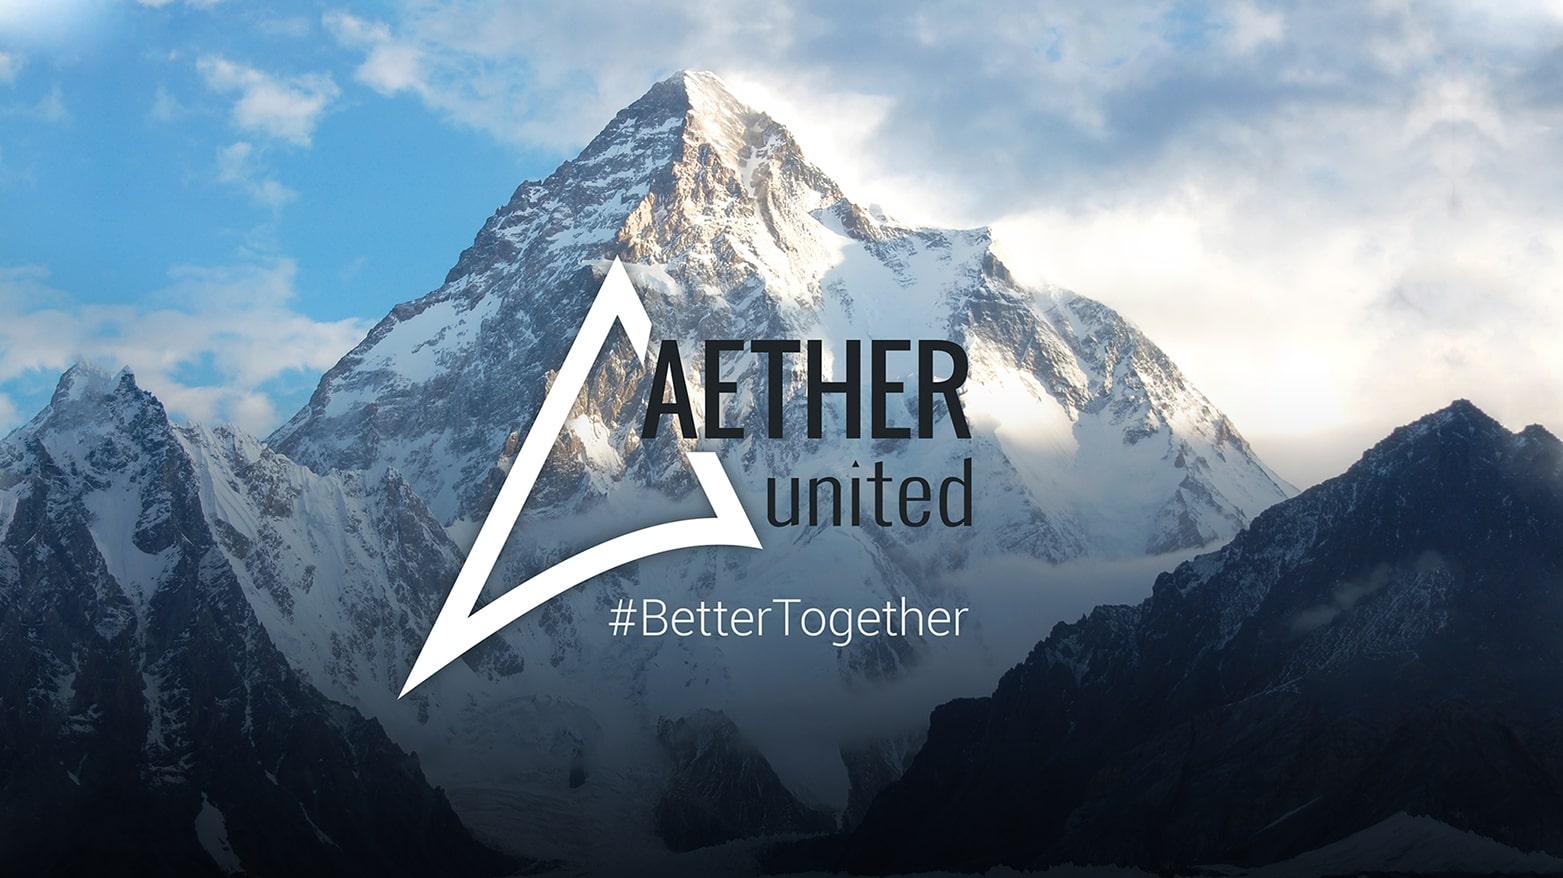 Aether United marketing assets by Alisha Rosen